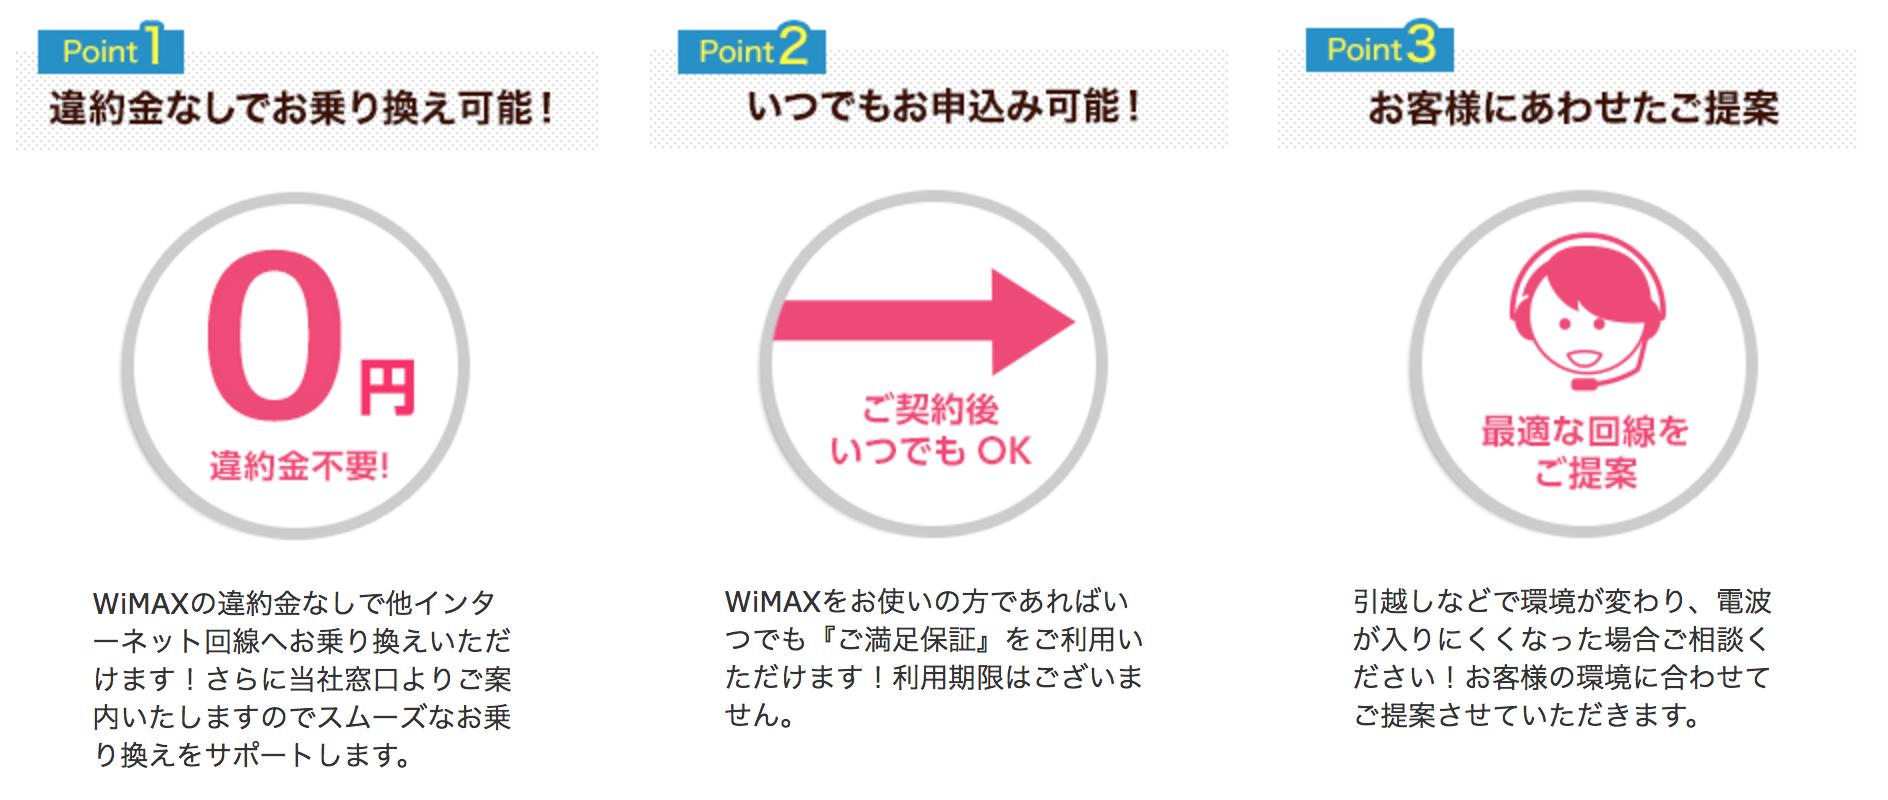 Broad WiMAX違約金なし_乗り換え_サービス内容